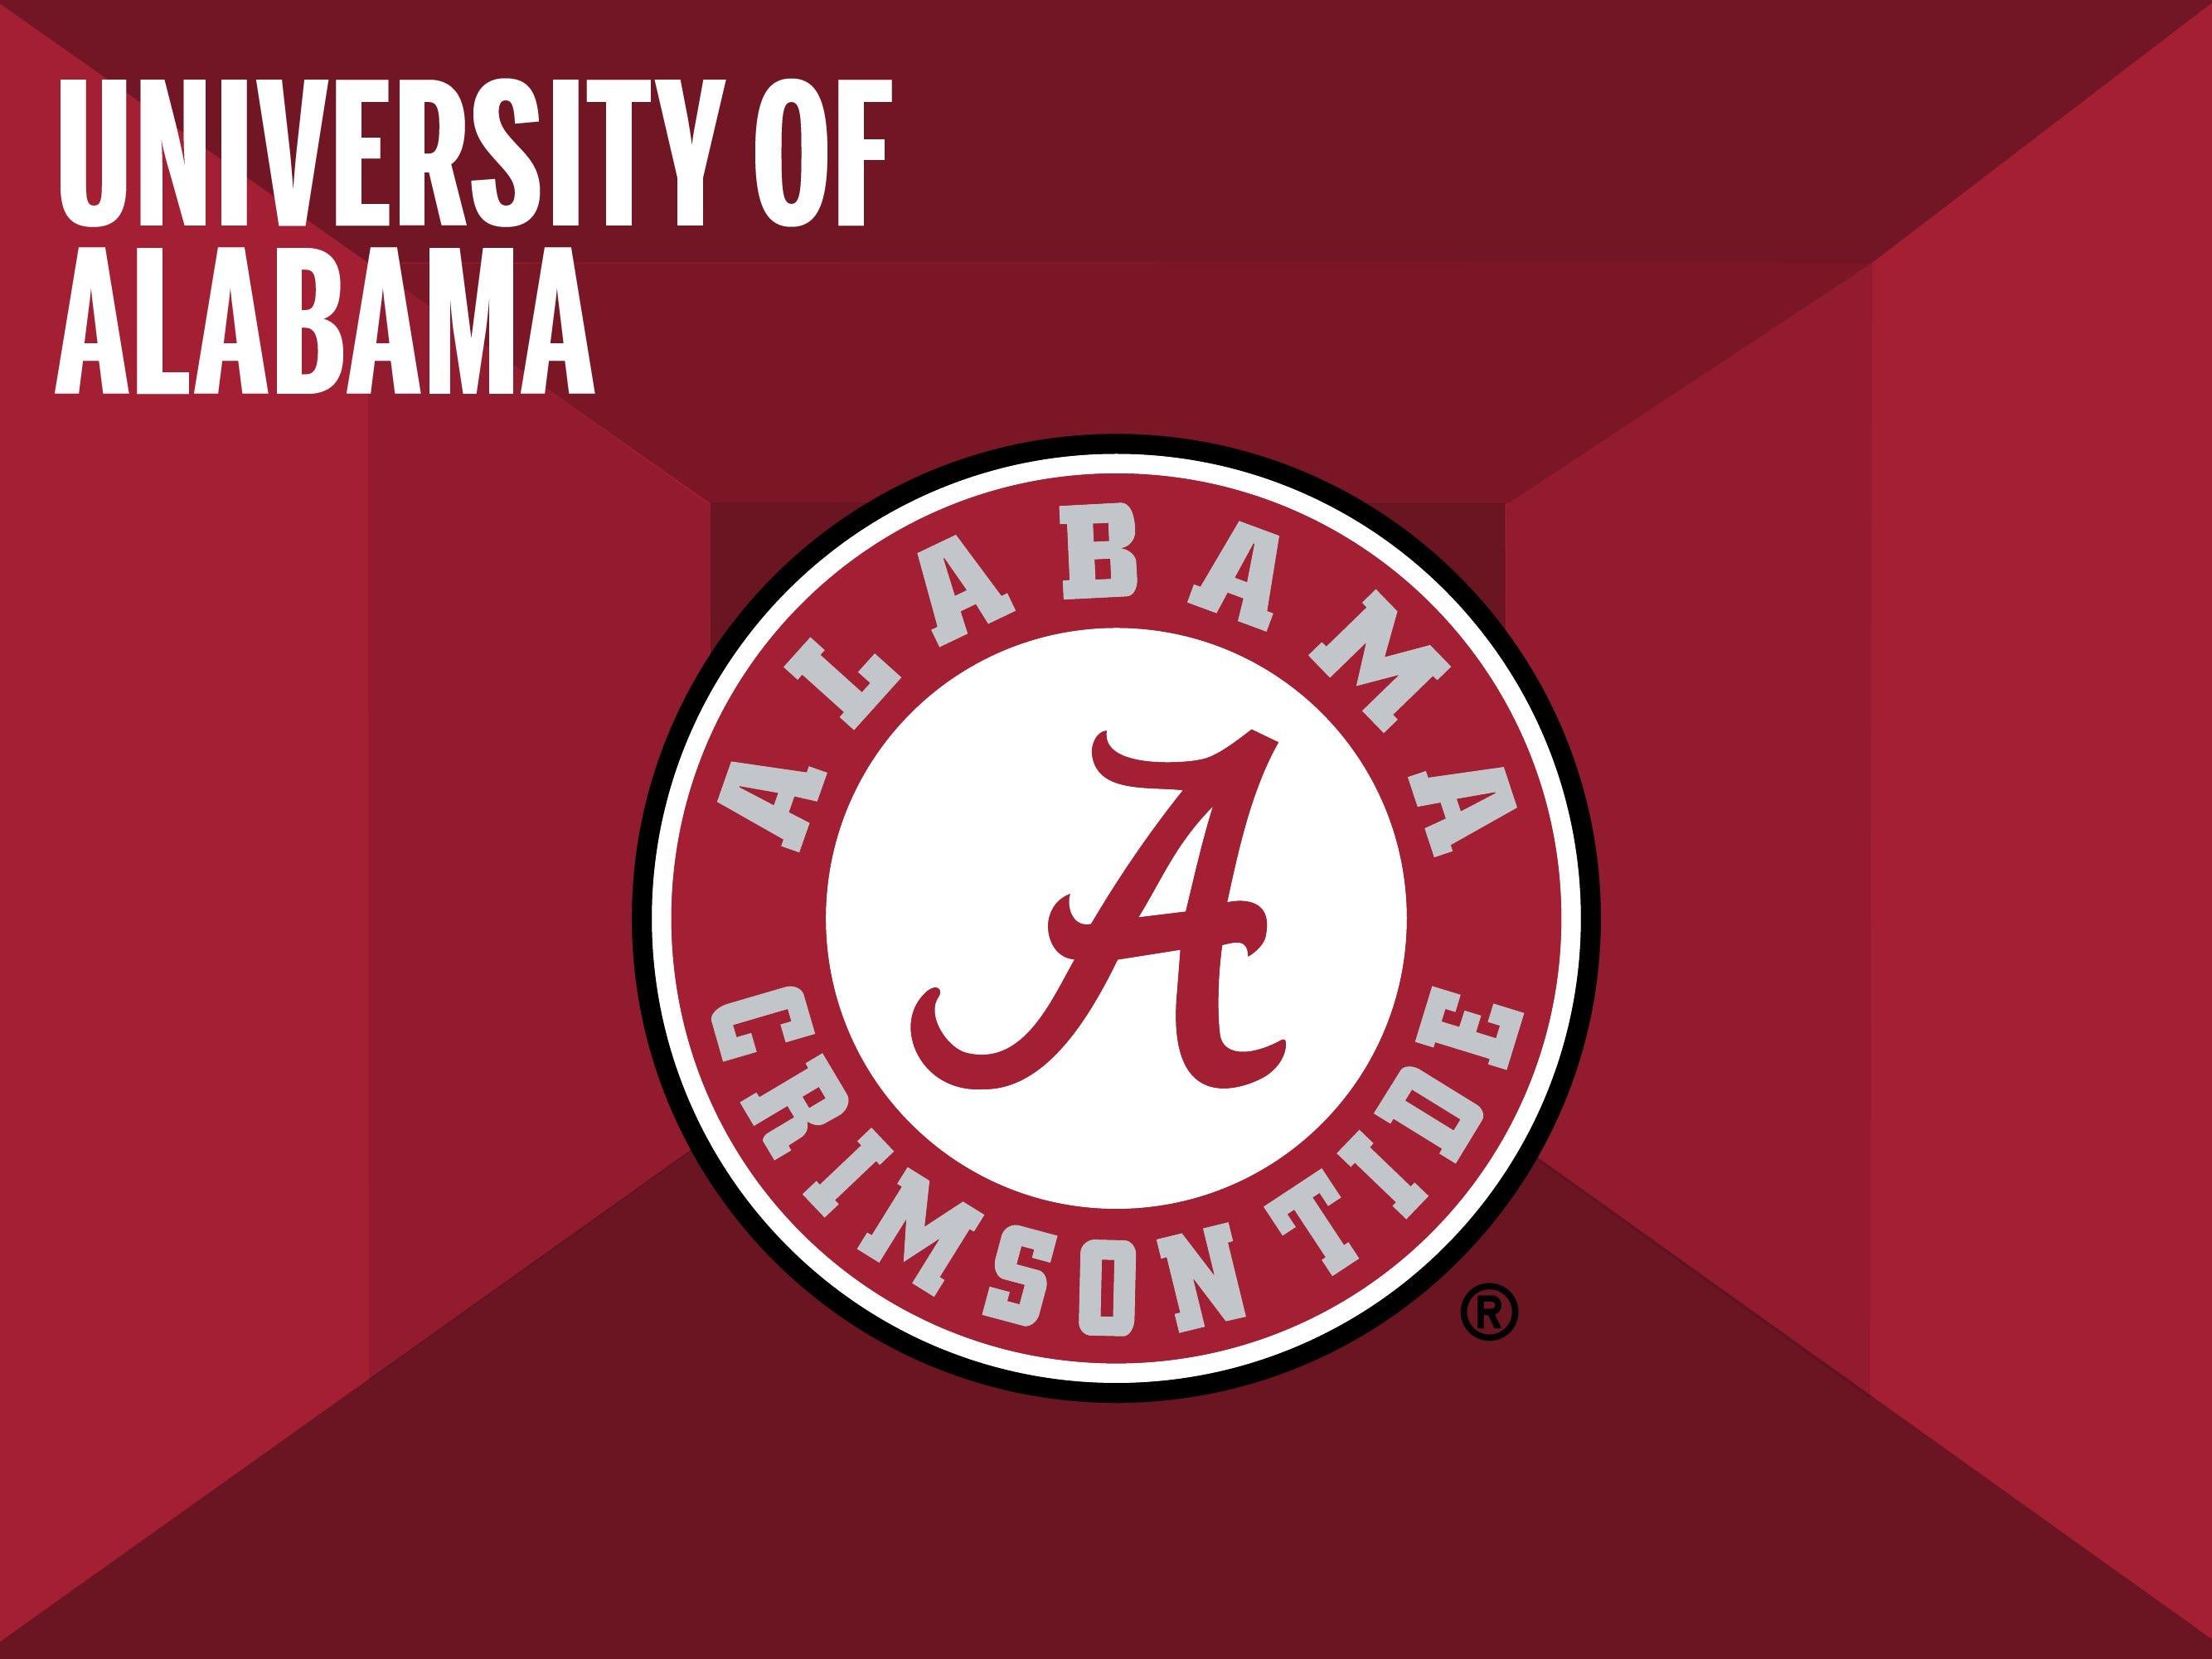 University of Alabama College Shop